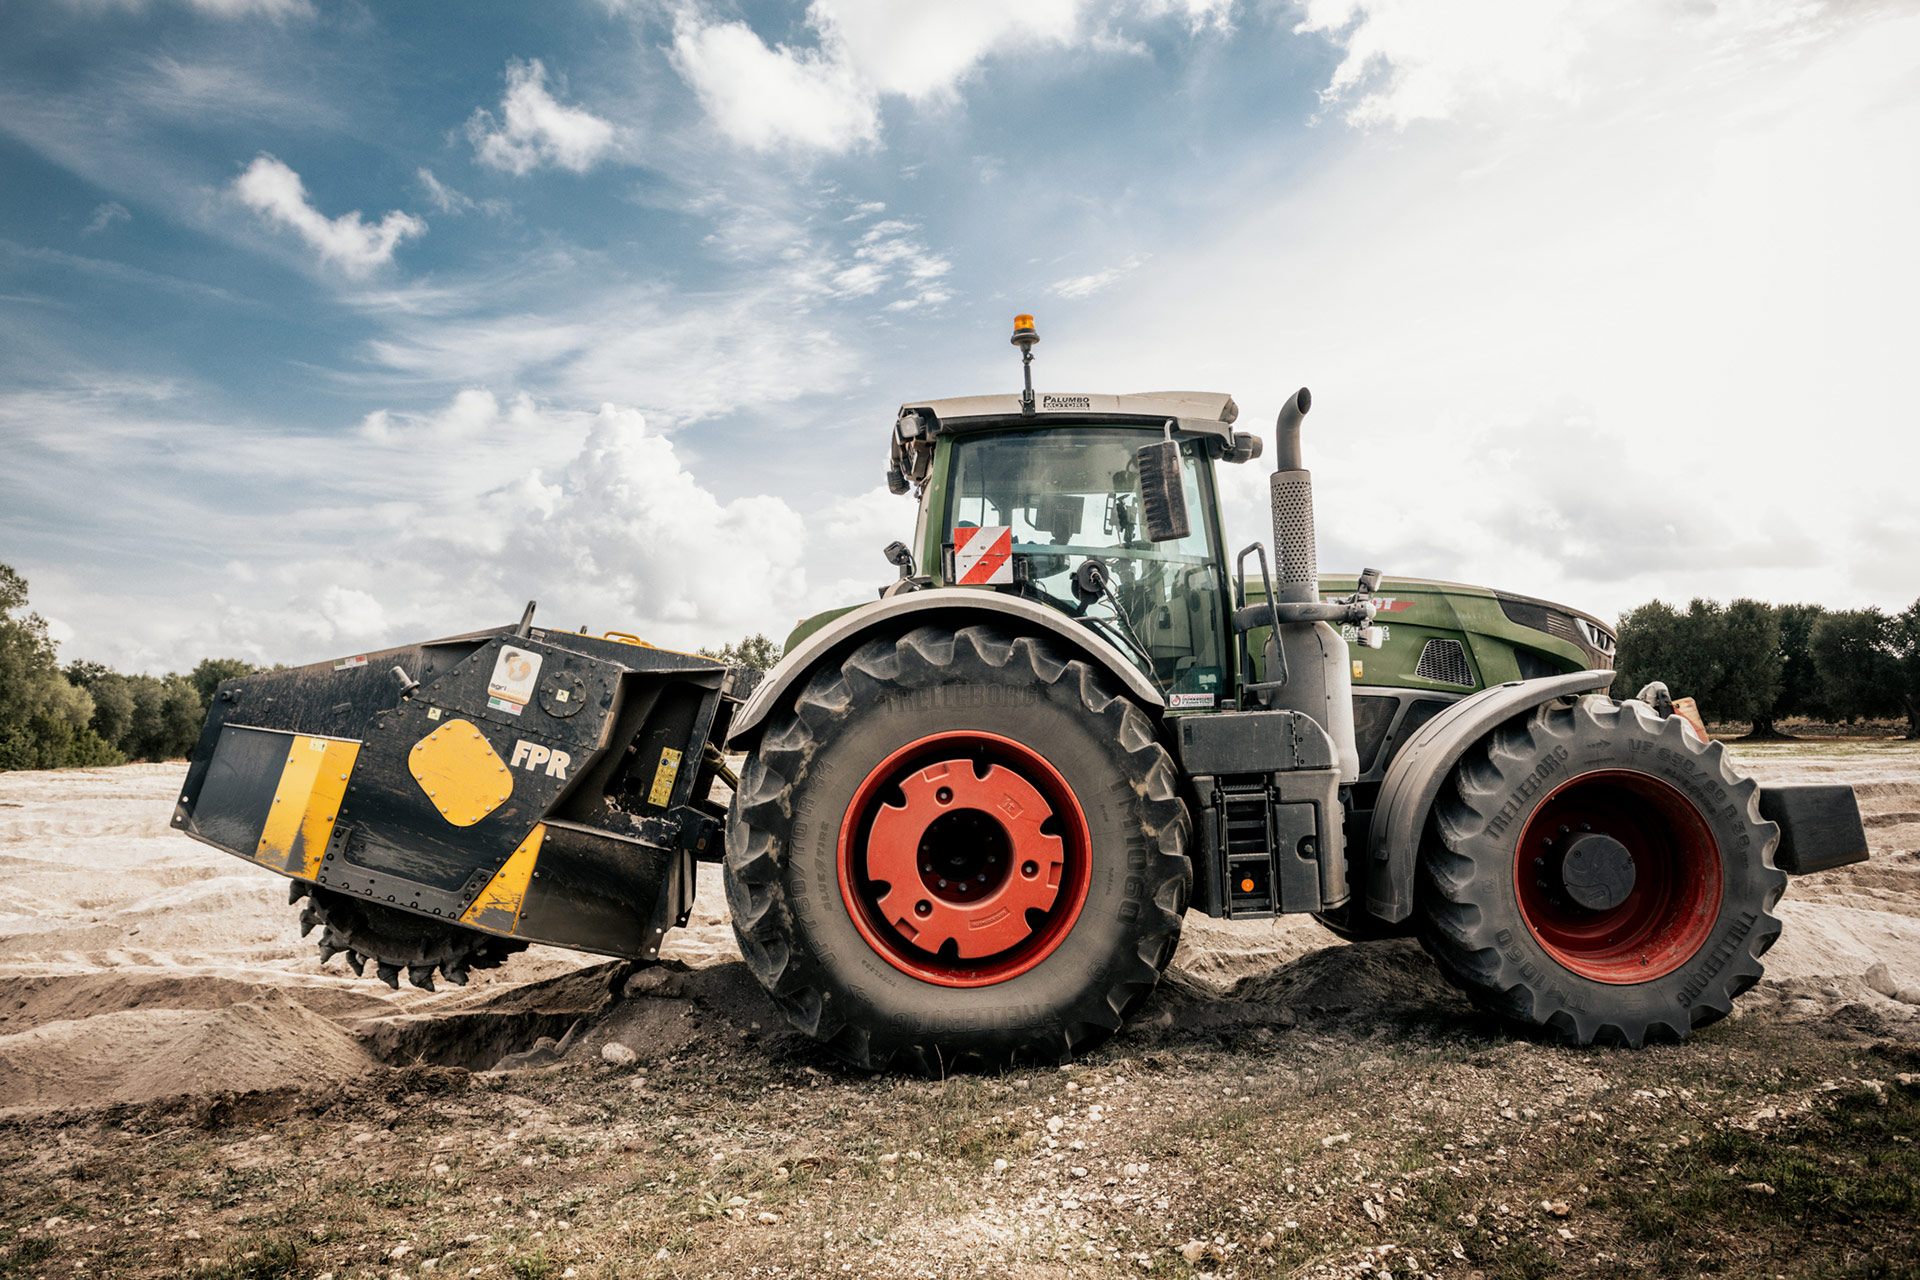 fresa per roccia-rock cutter-macchine agricole-altamura-italy